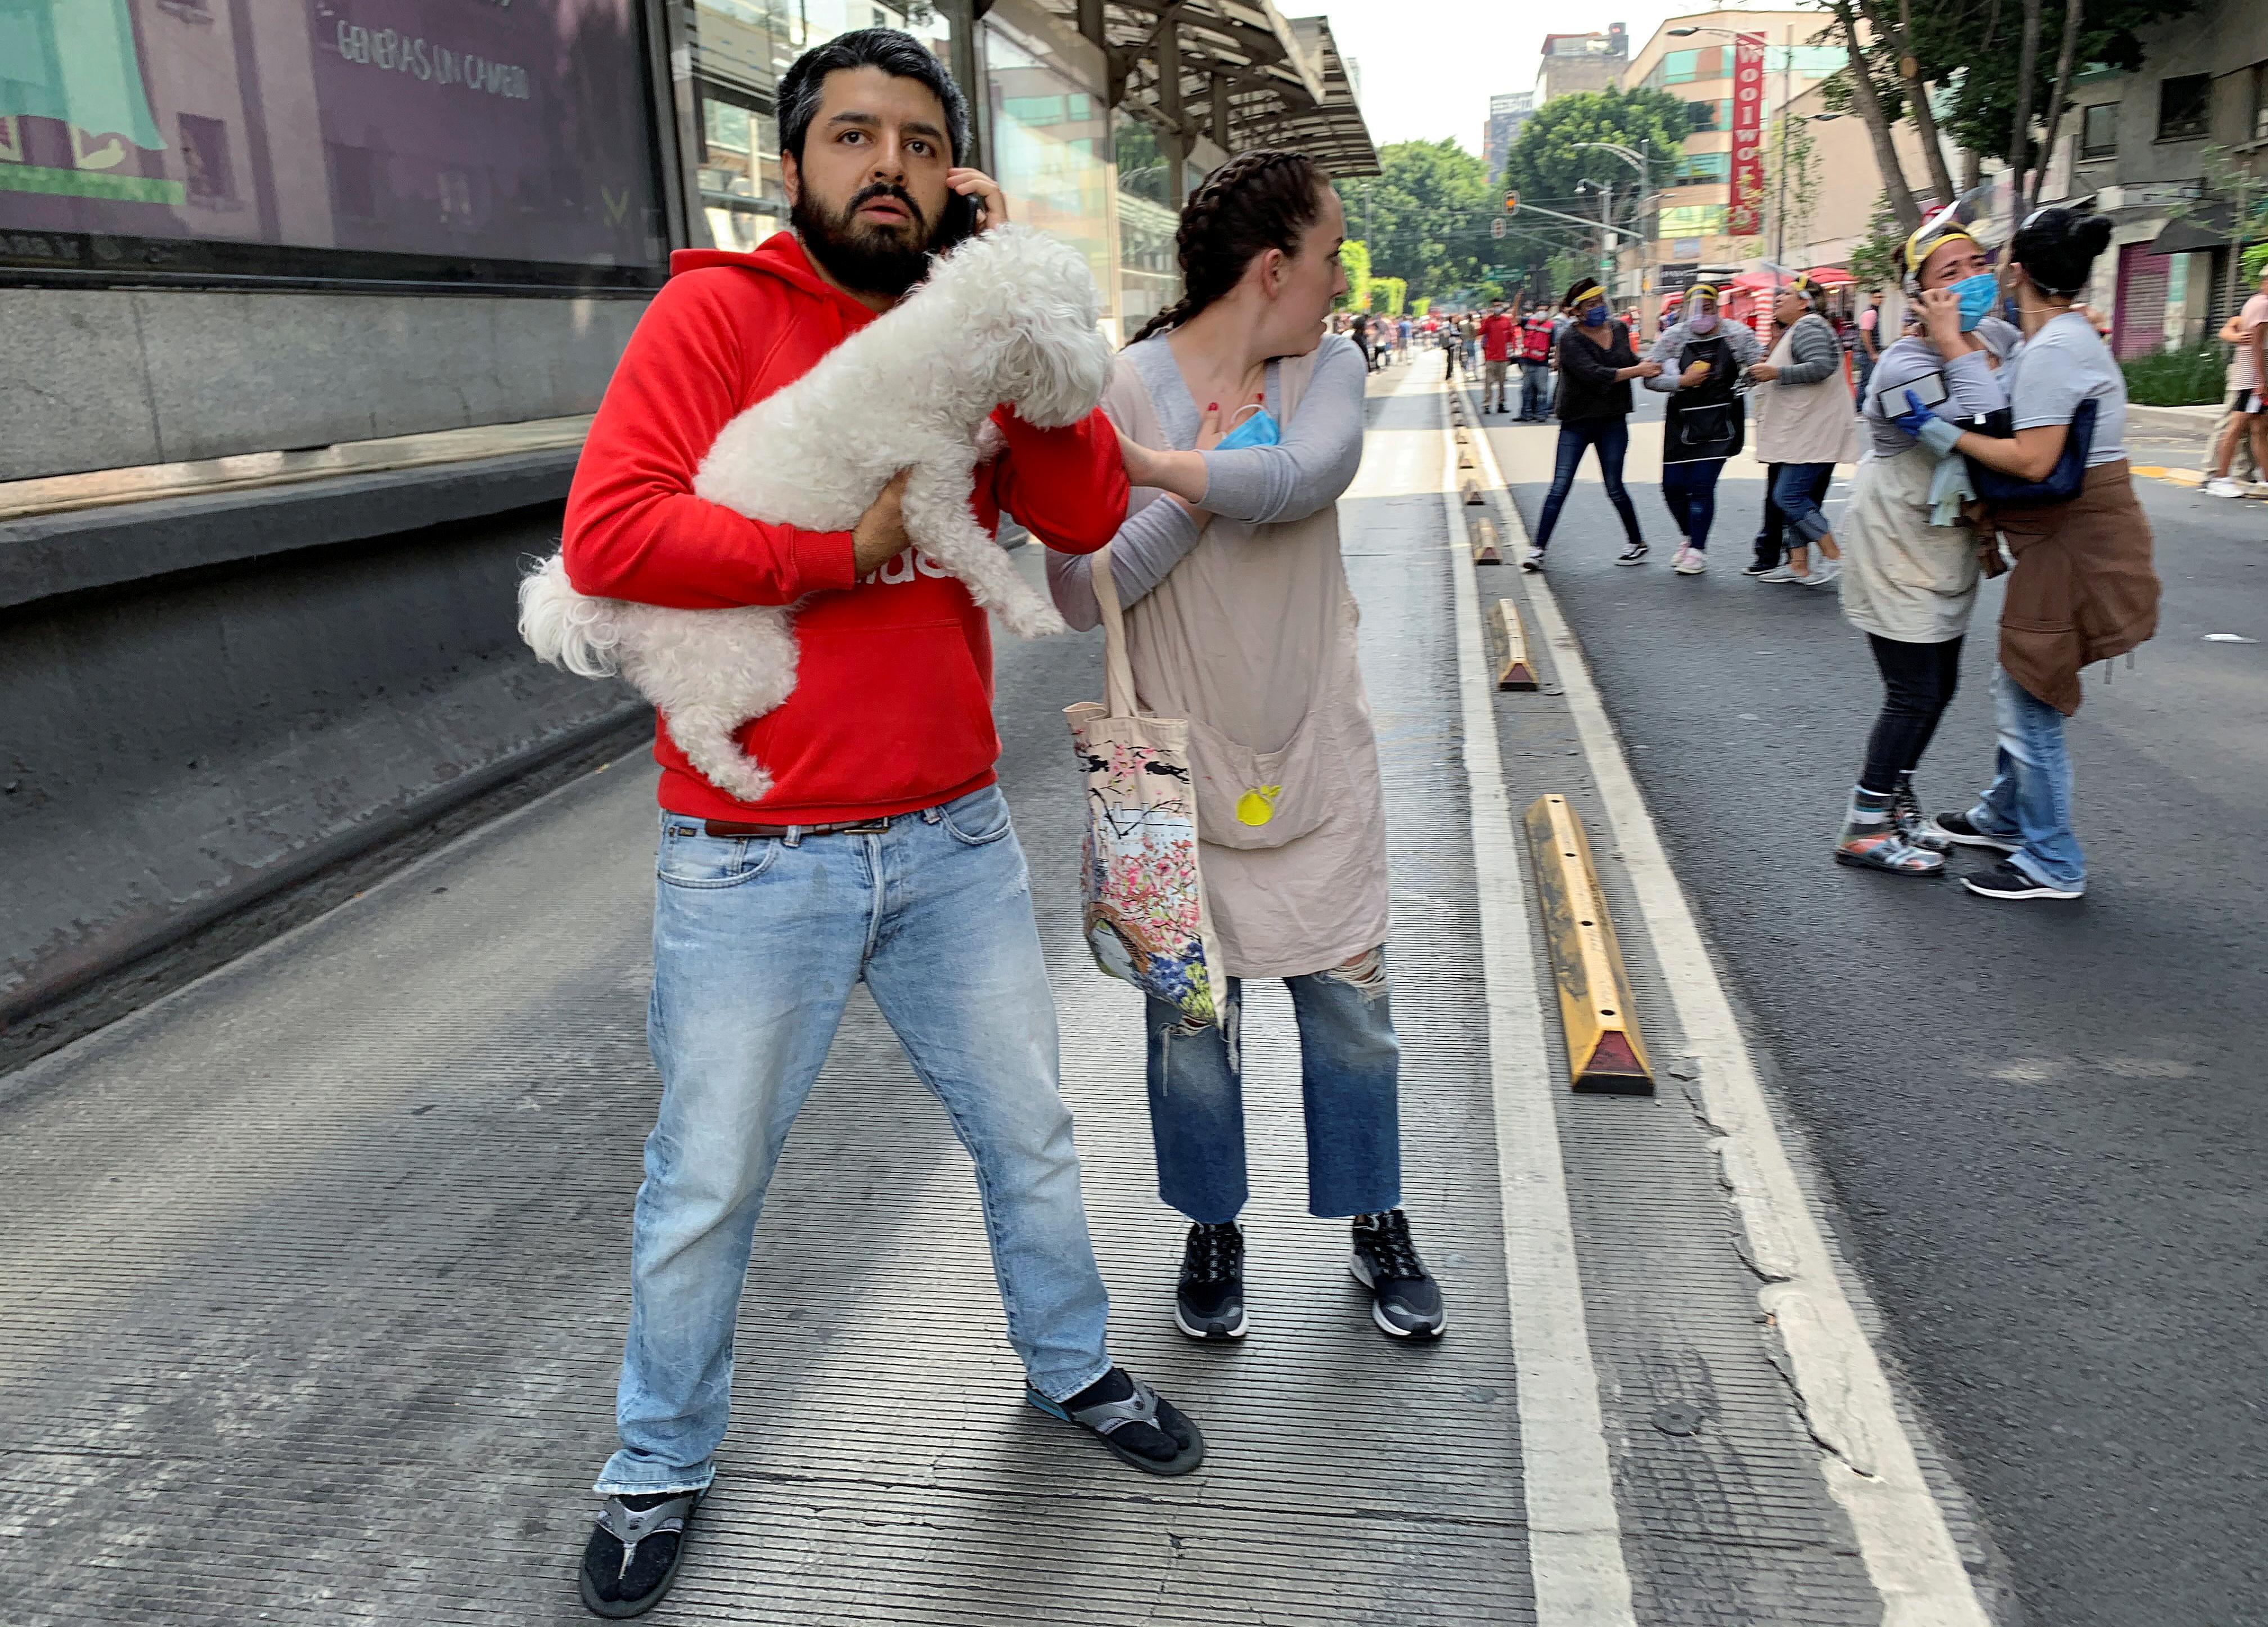 Foto: REUTERS/Tomas Bravo